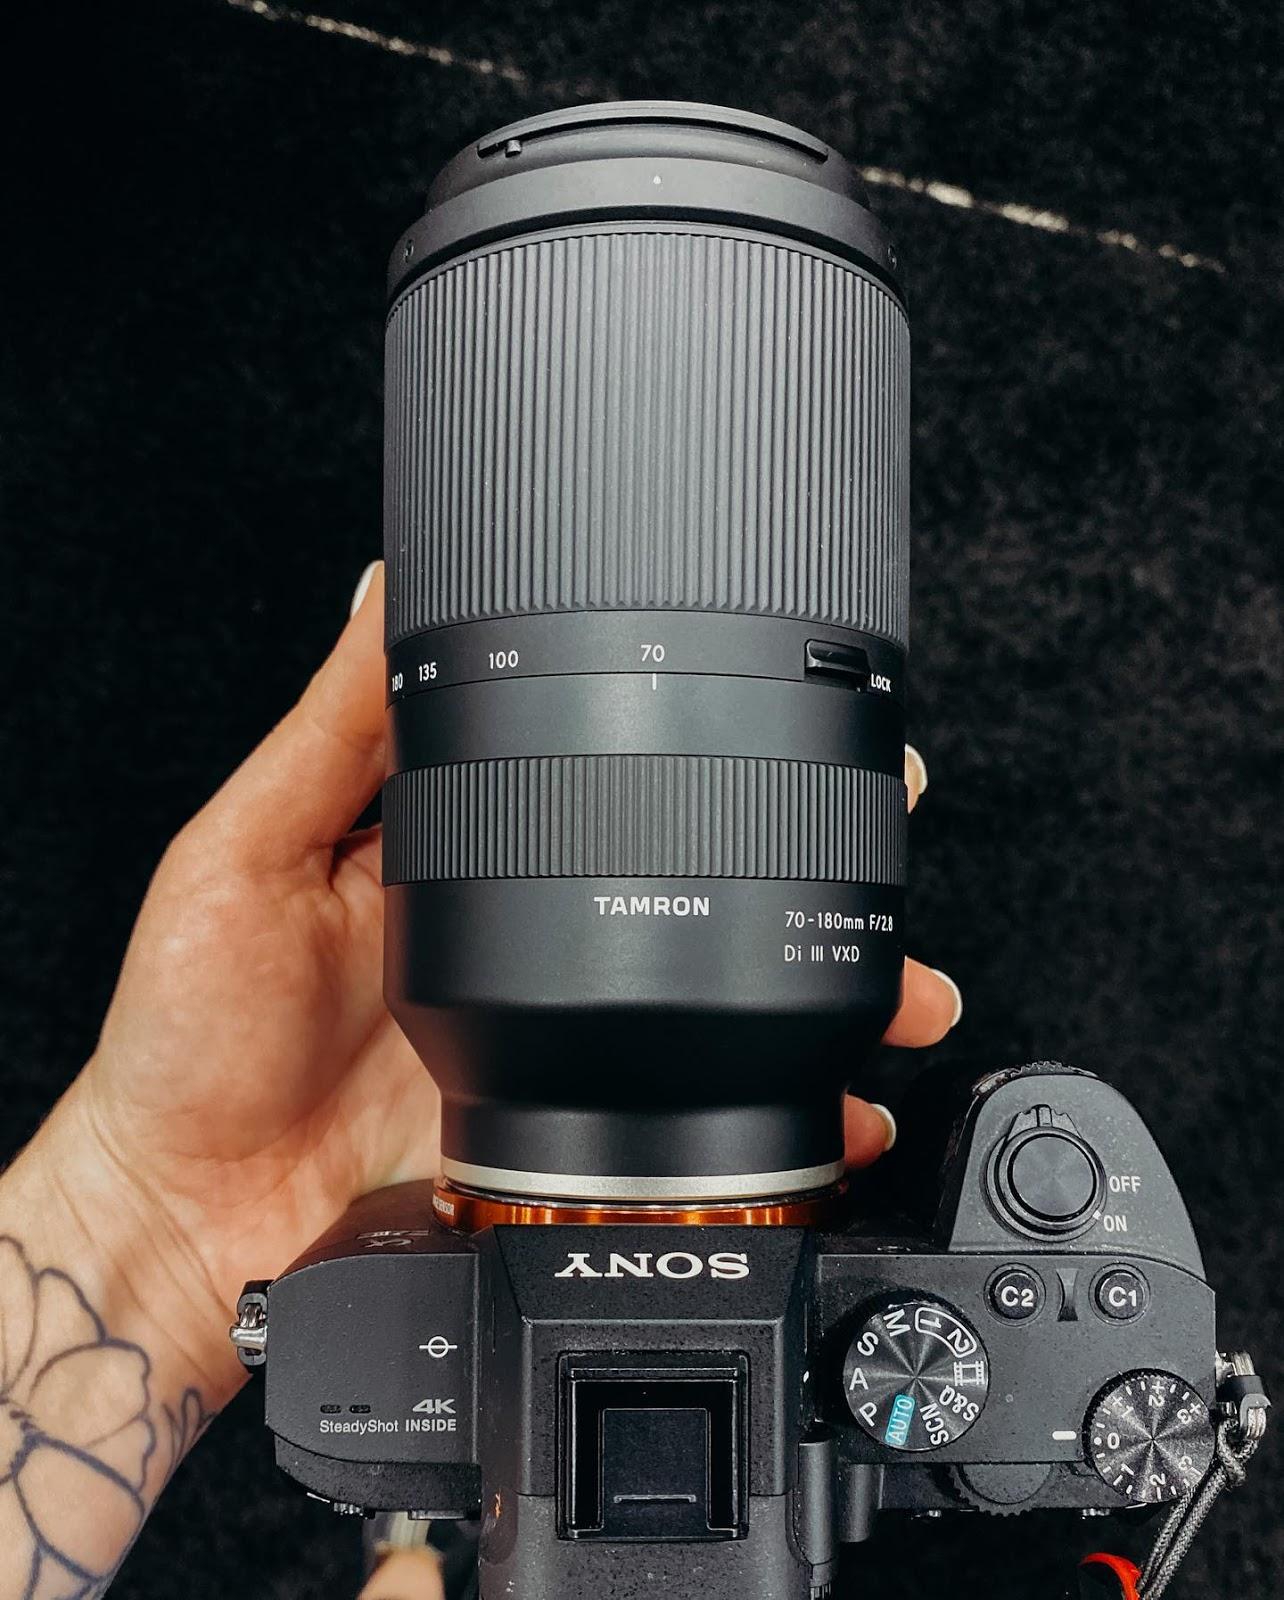 Объектив Tamron 70-180mm f/2.8 на камере Sony